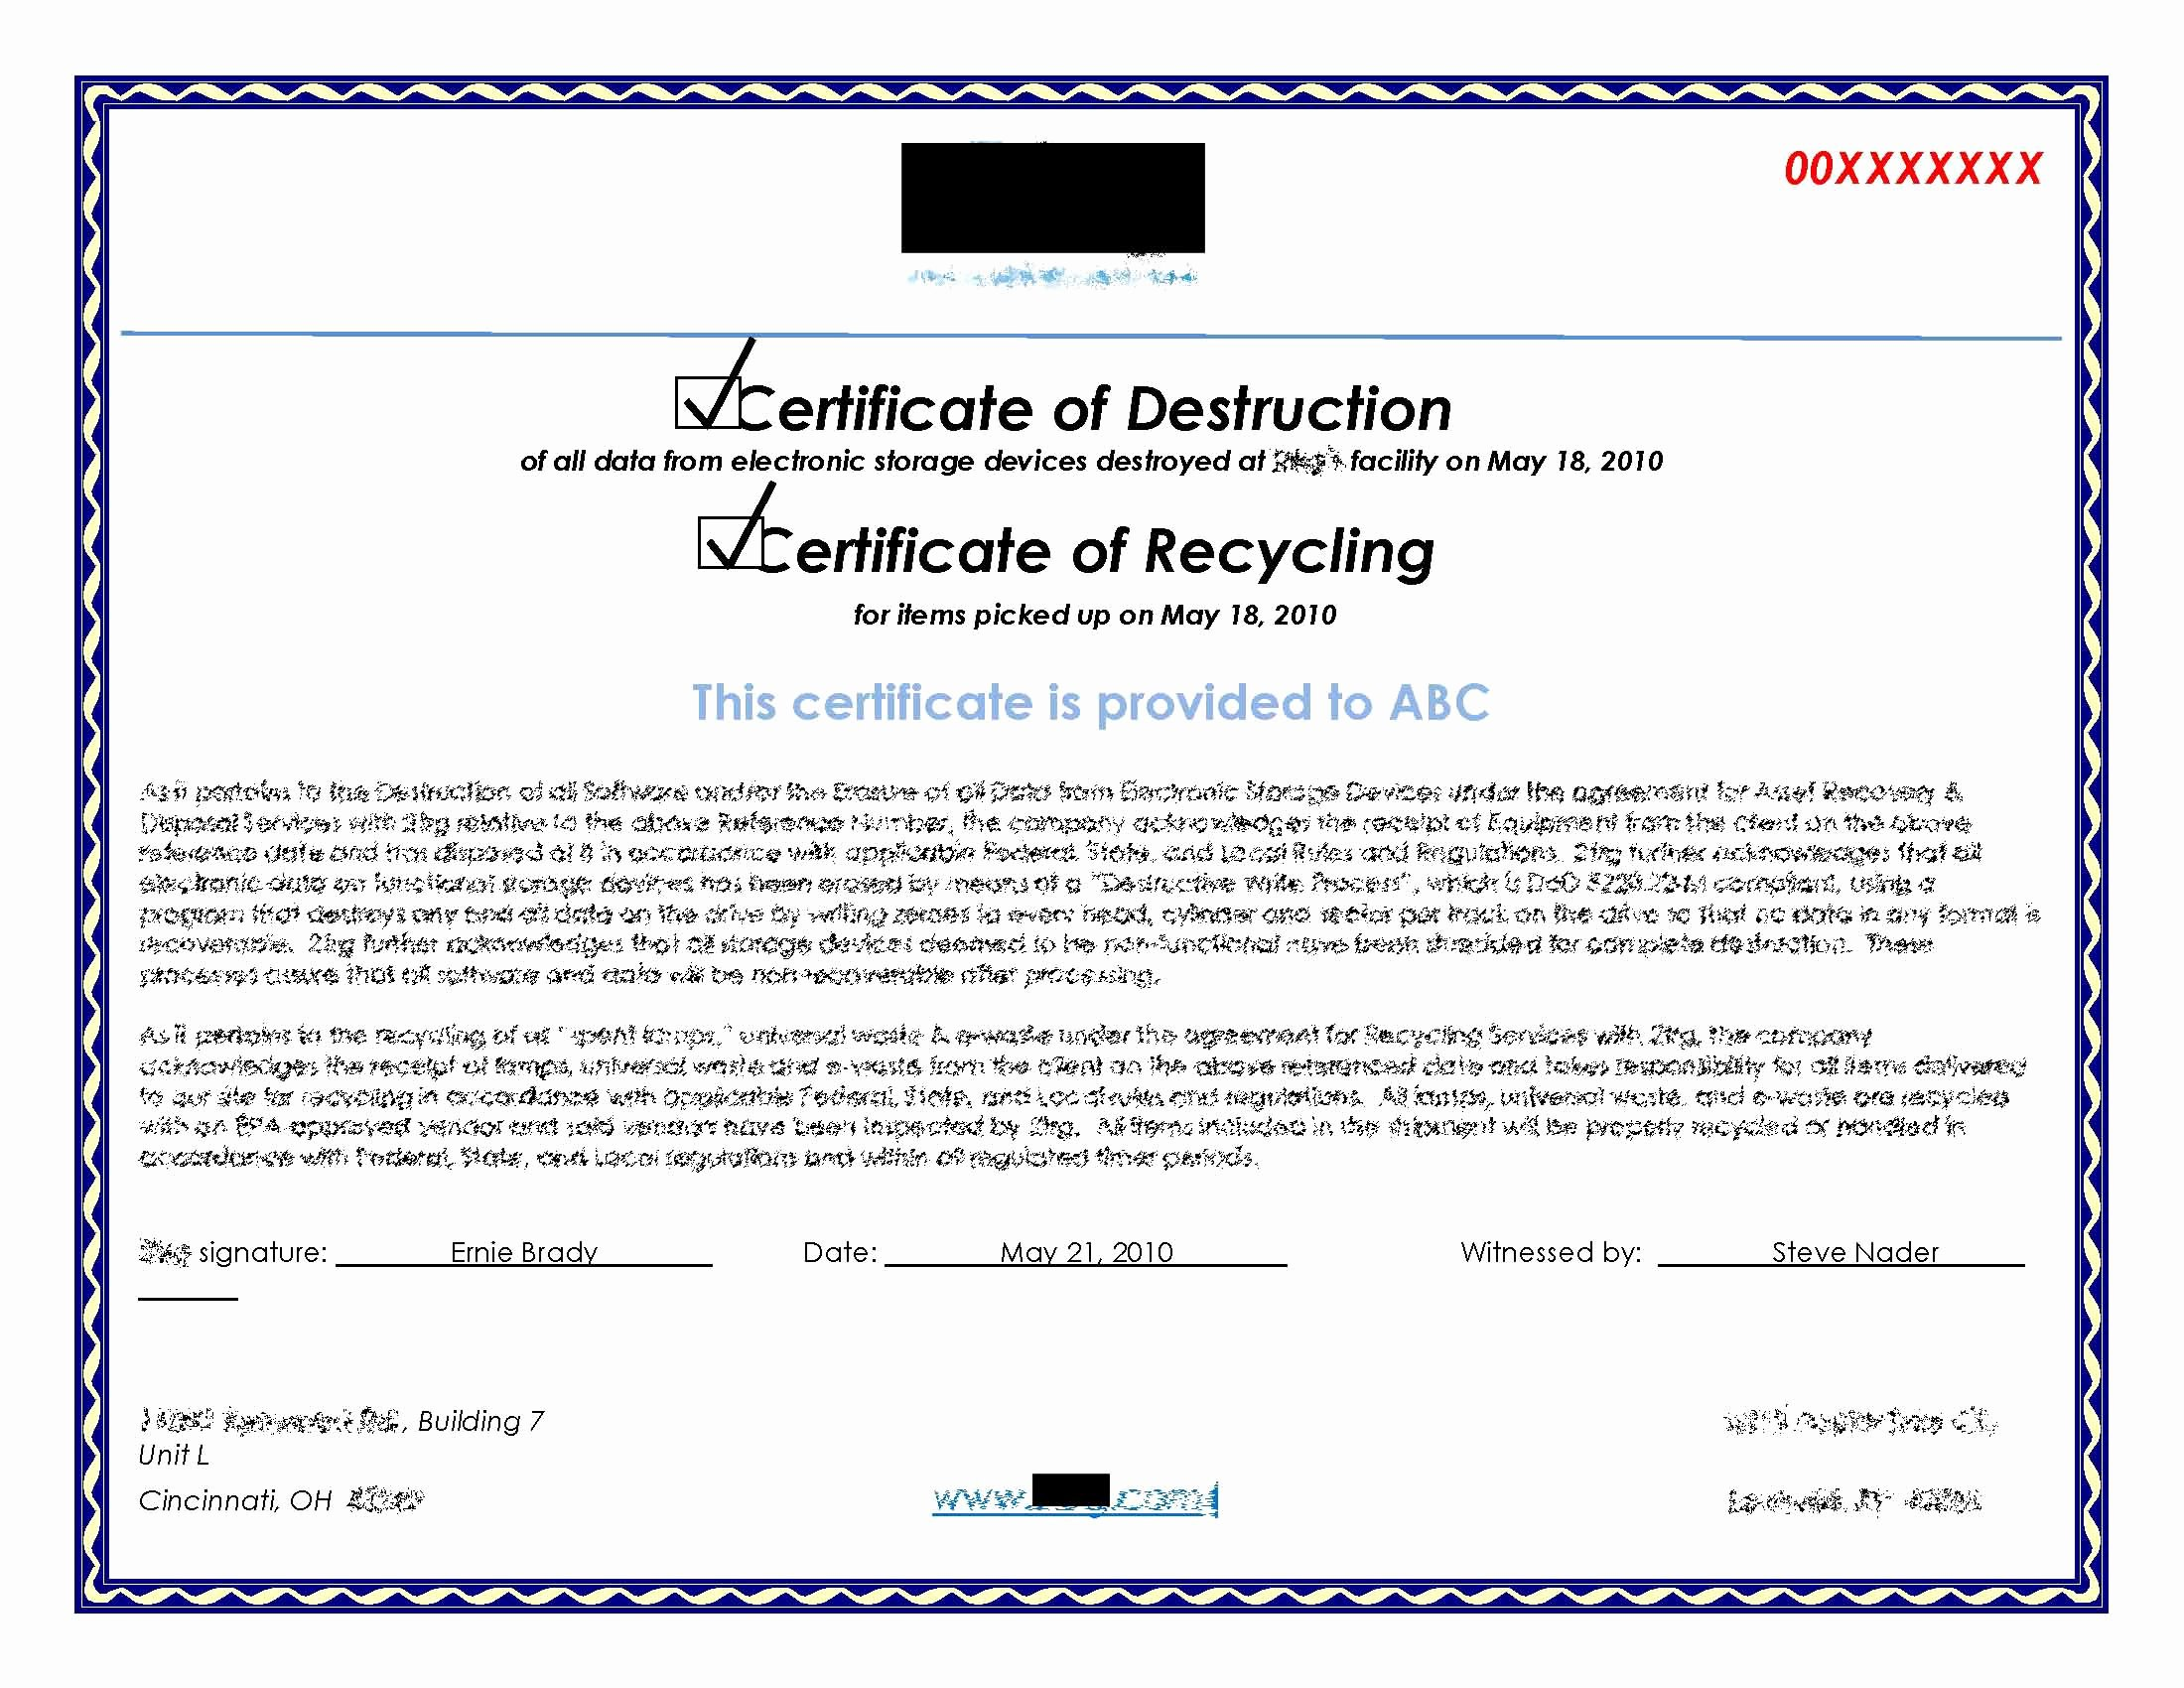 Hard Drive Destruction Certificate Template Beautiful Hard Drive Destruction for Copier Mfp Printers